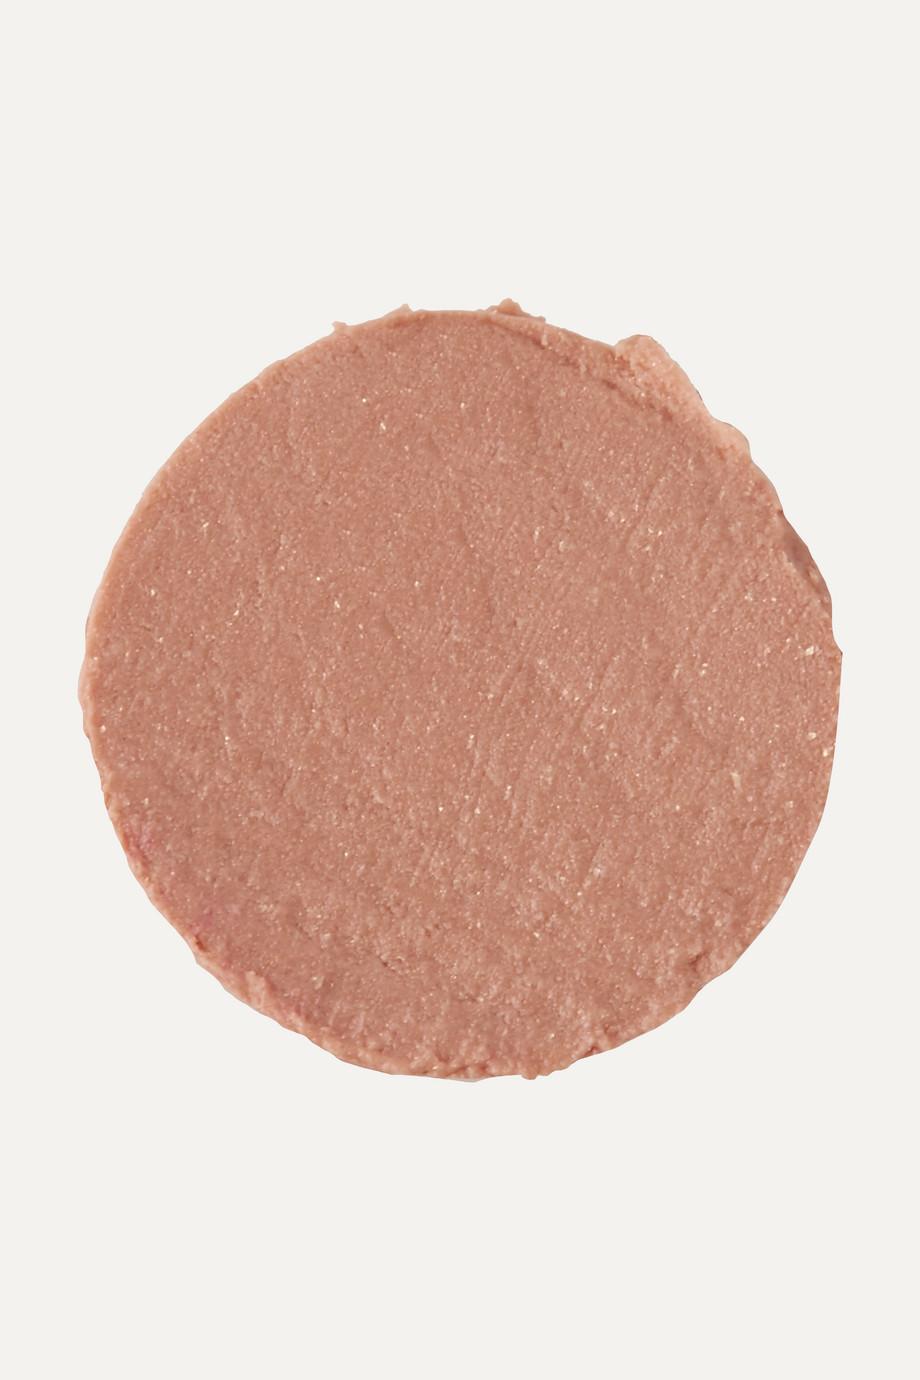 Serge Lutens Lipstick – Rose des Glaces 25 – Lippenstift